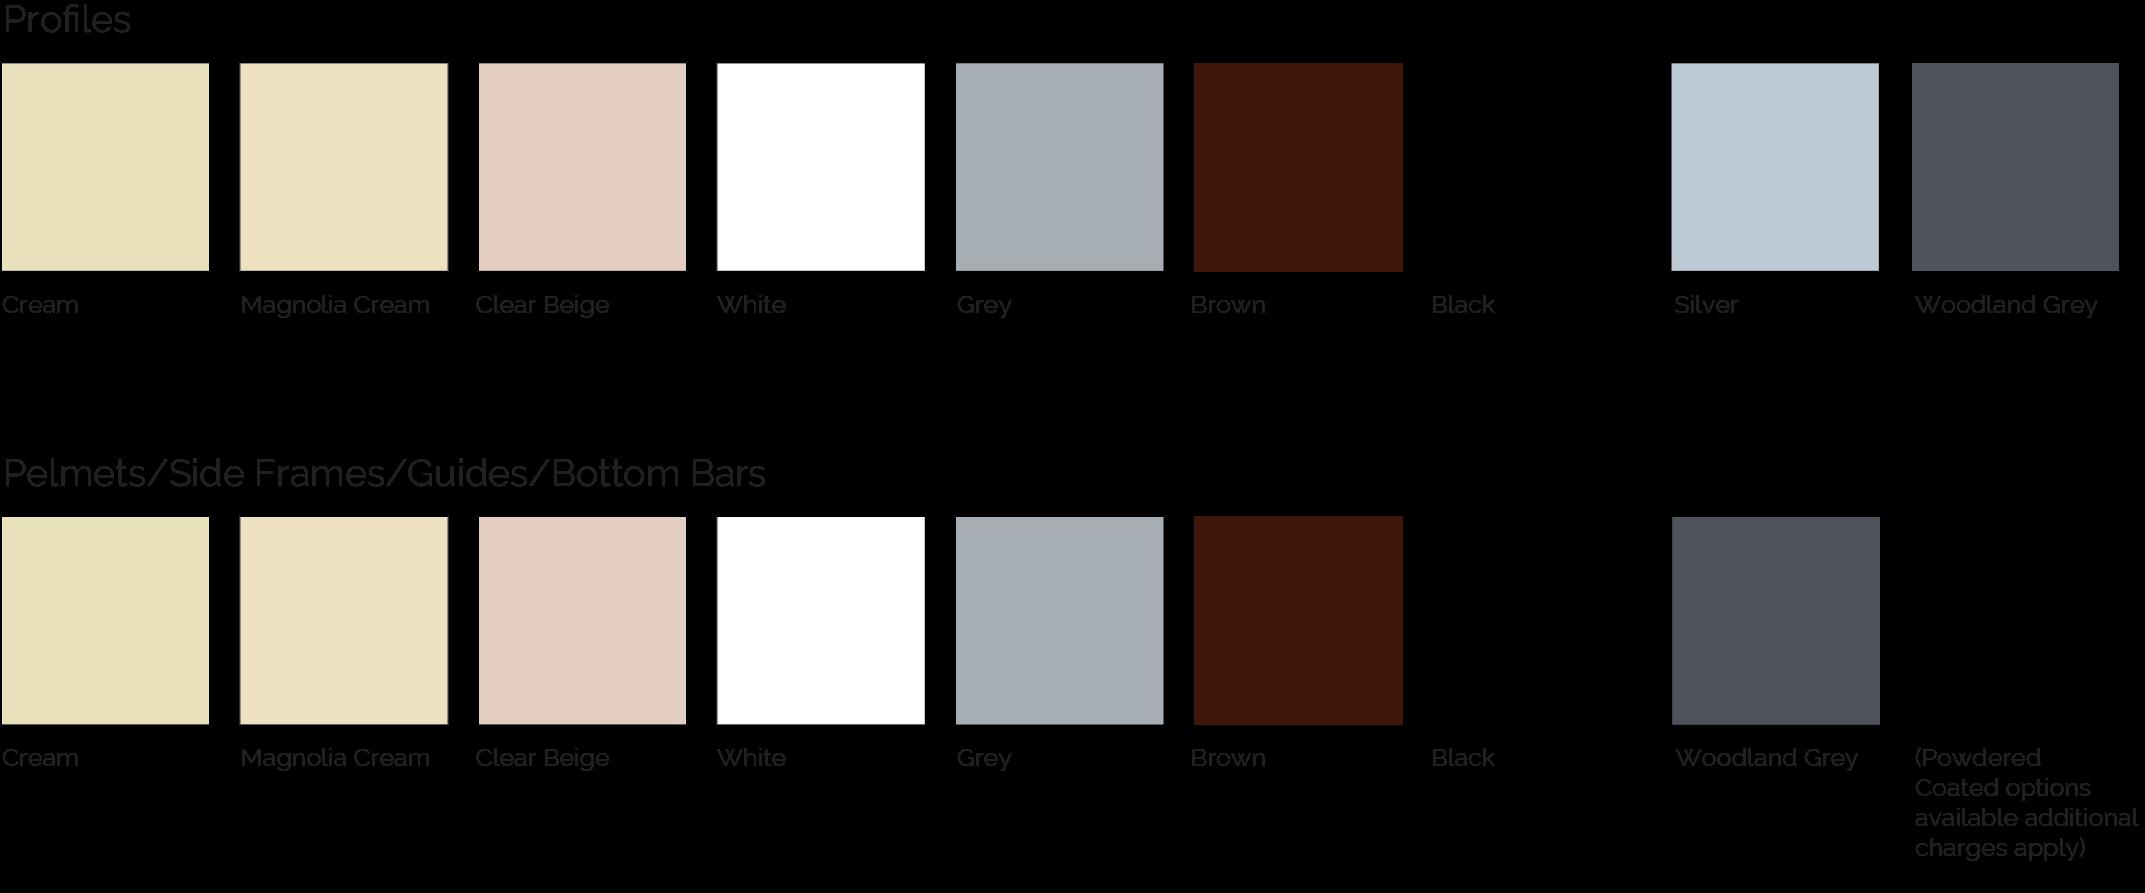 widespan colour options